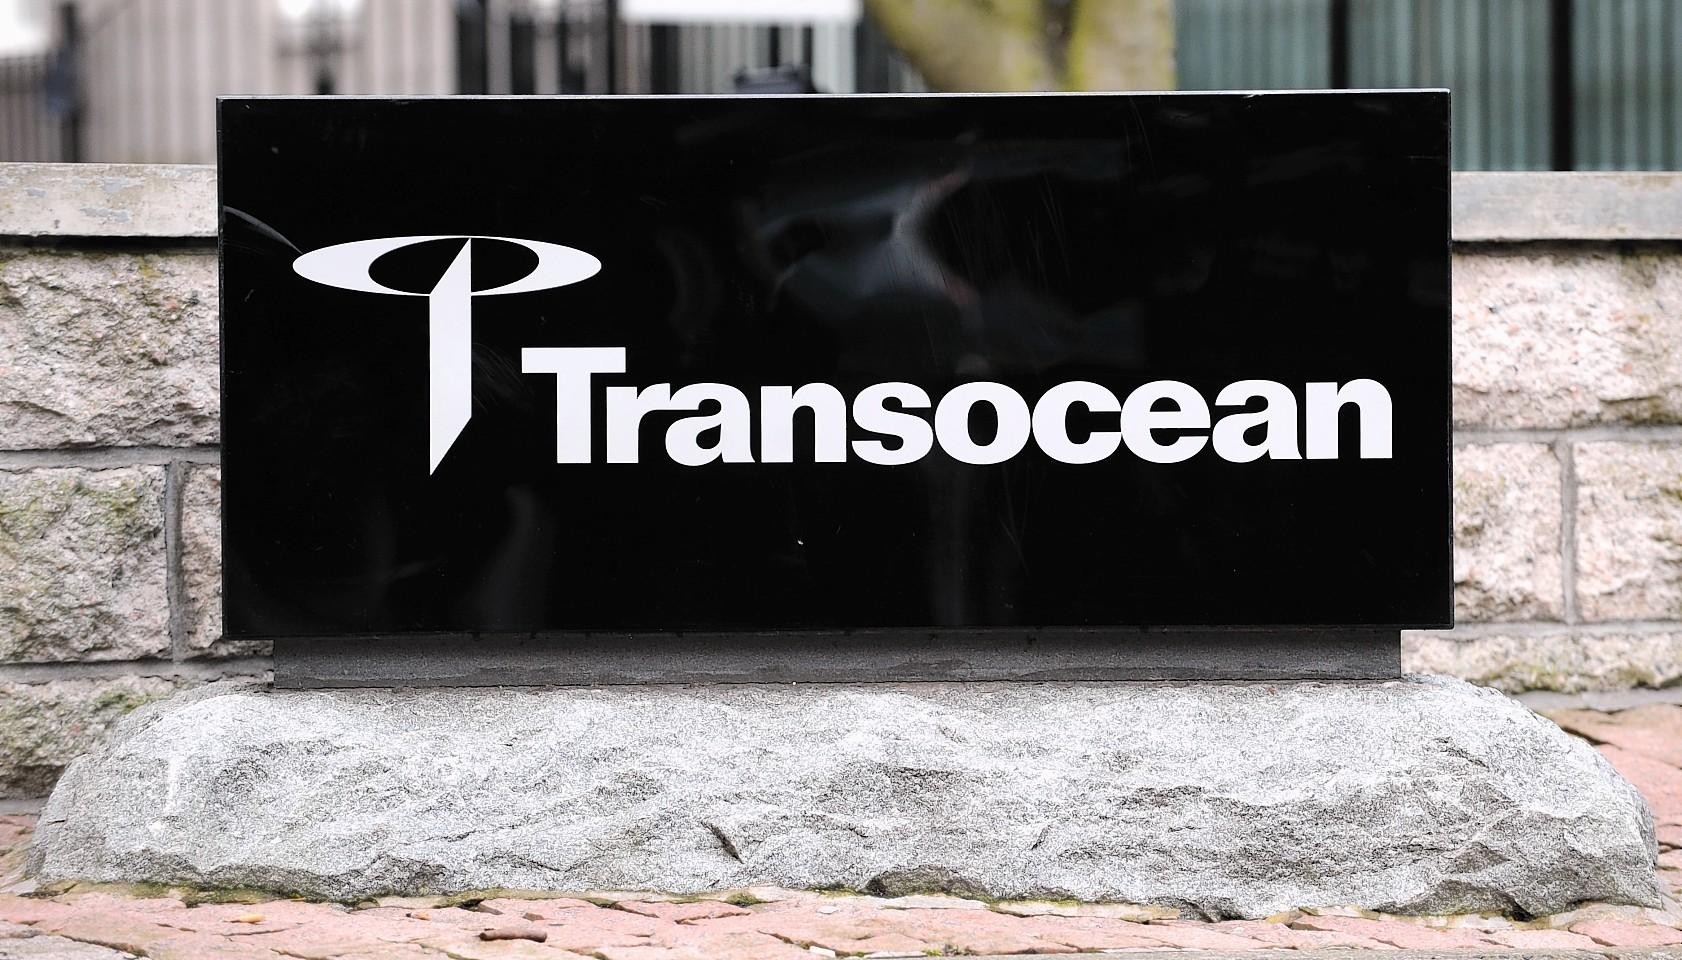 Transocean's offices in Aberdeen